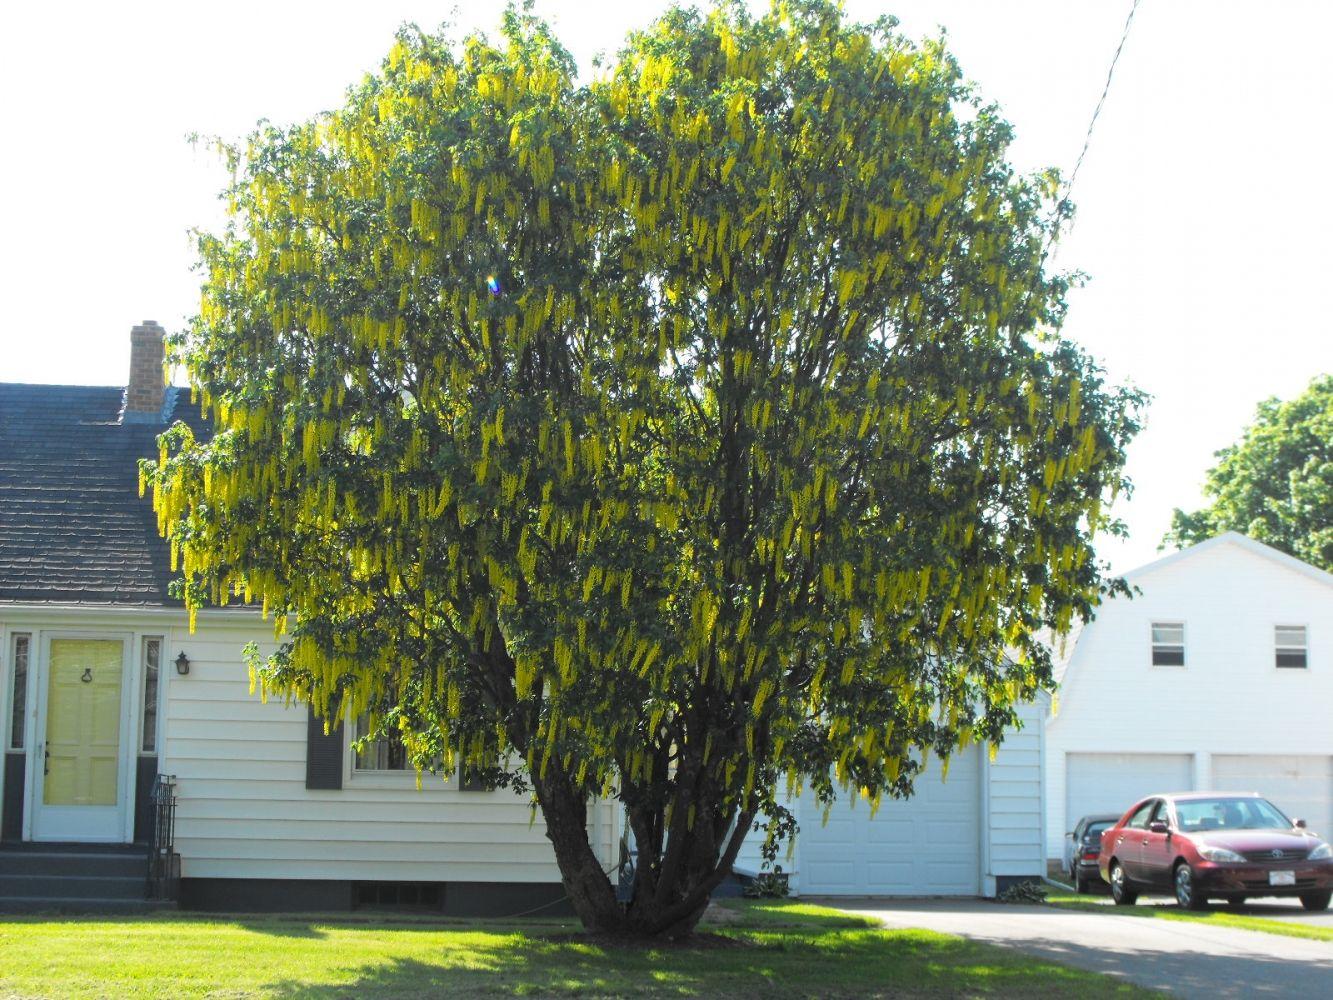 Golden Chain Tree ornamental trees | My Secret Garden ✿ | Pinterest ...